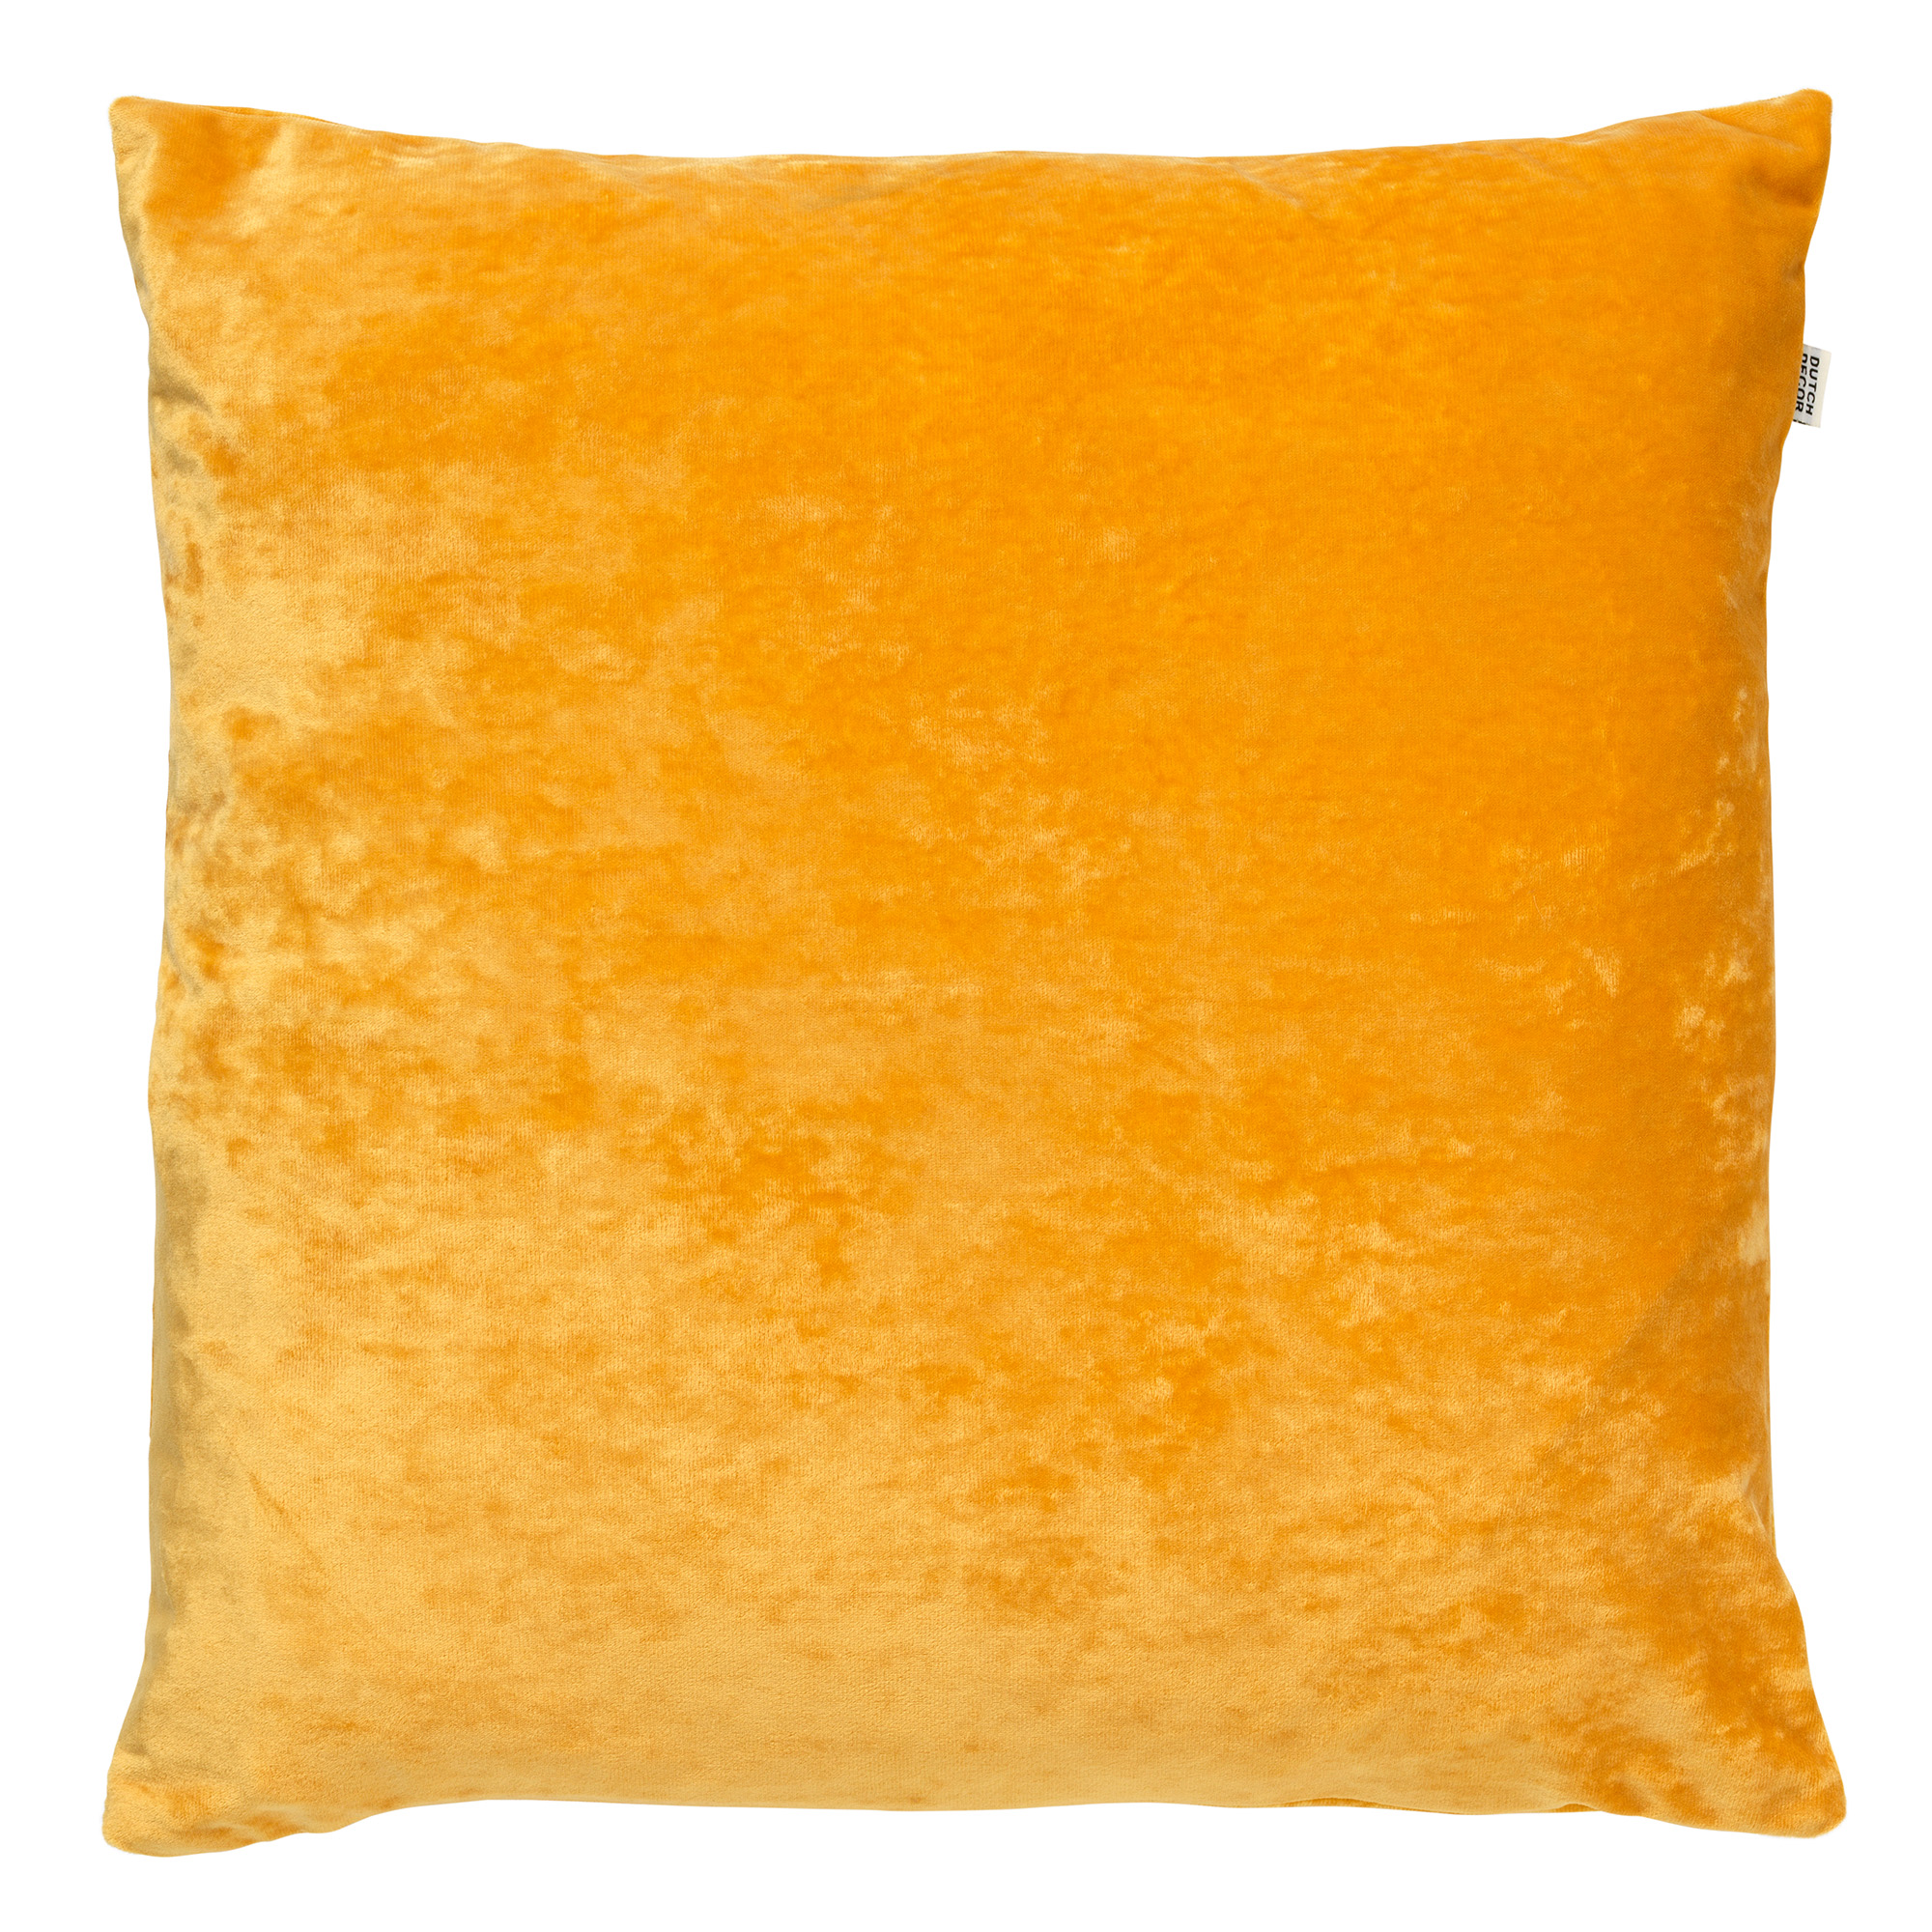 SKY - Sierkussen velvet Golden Glow 45x45 cm